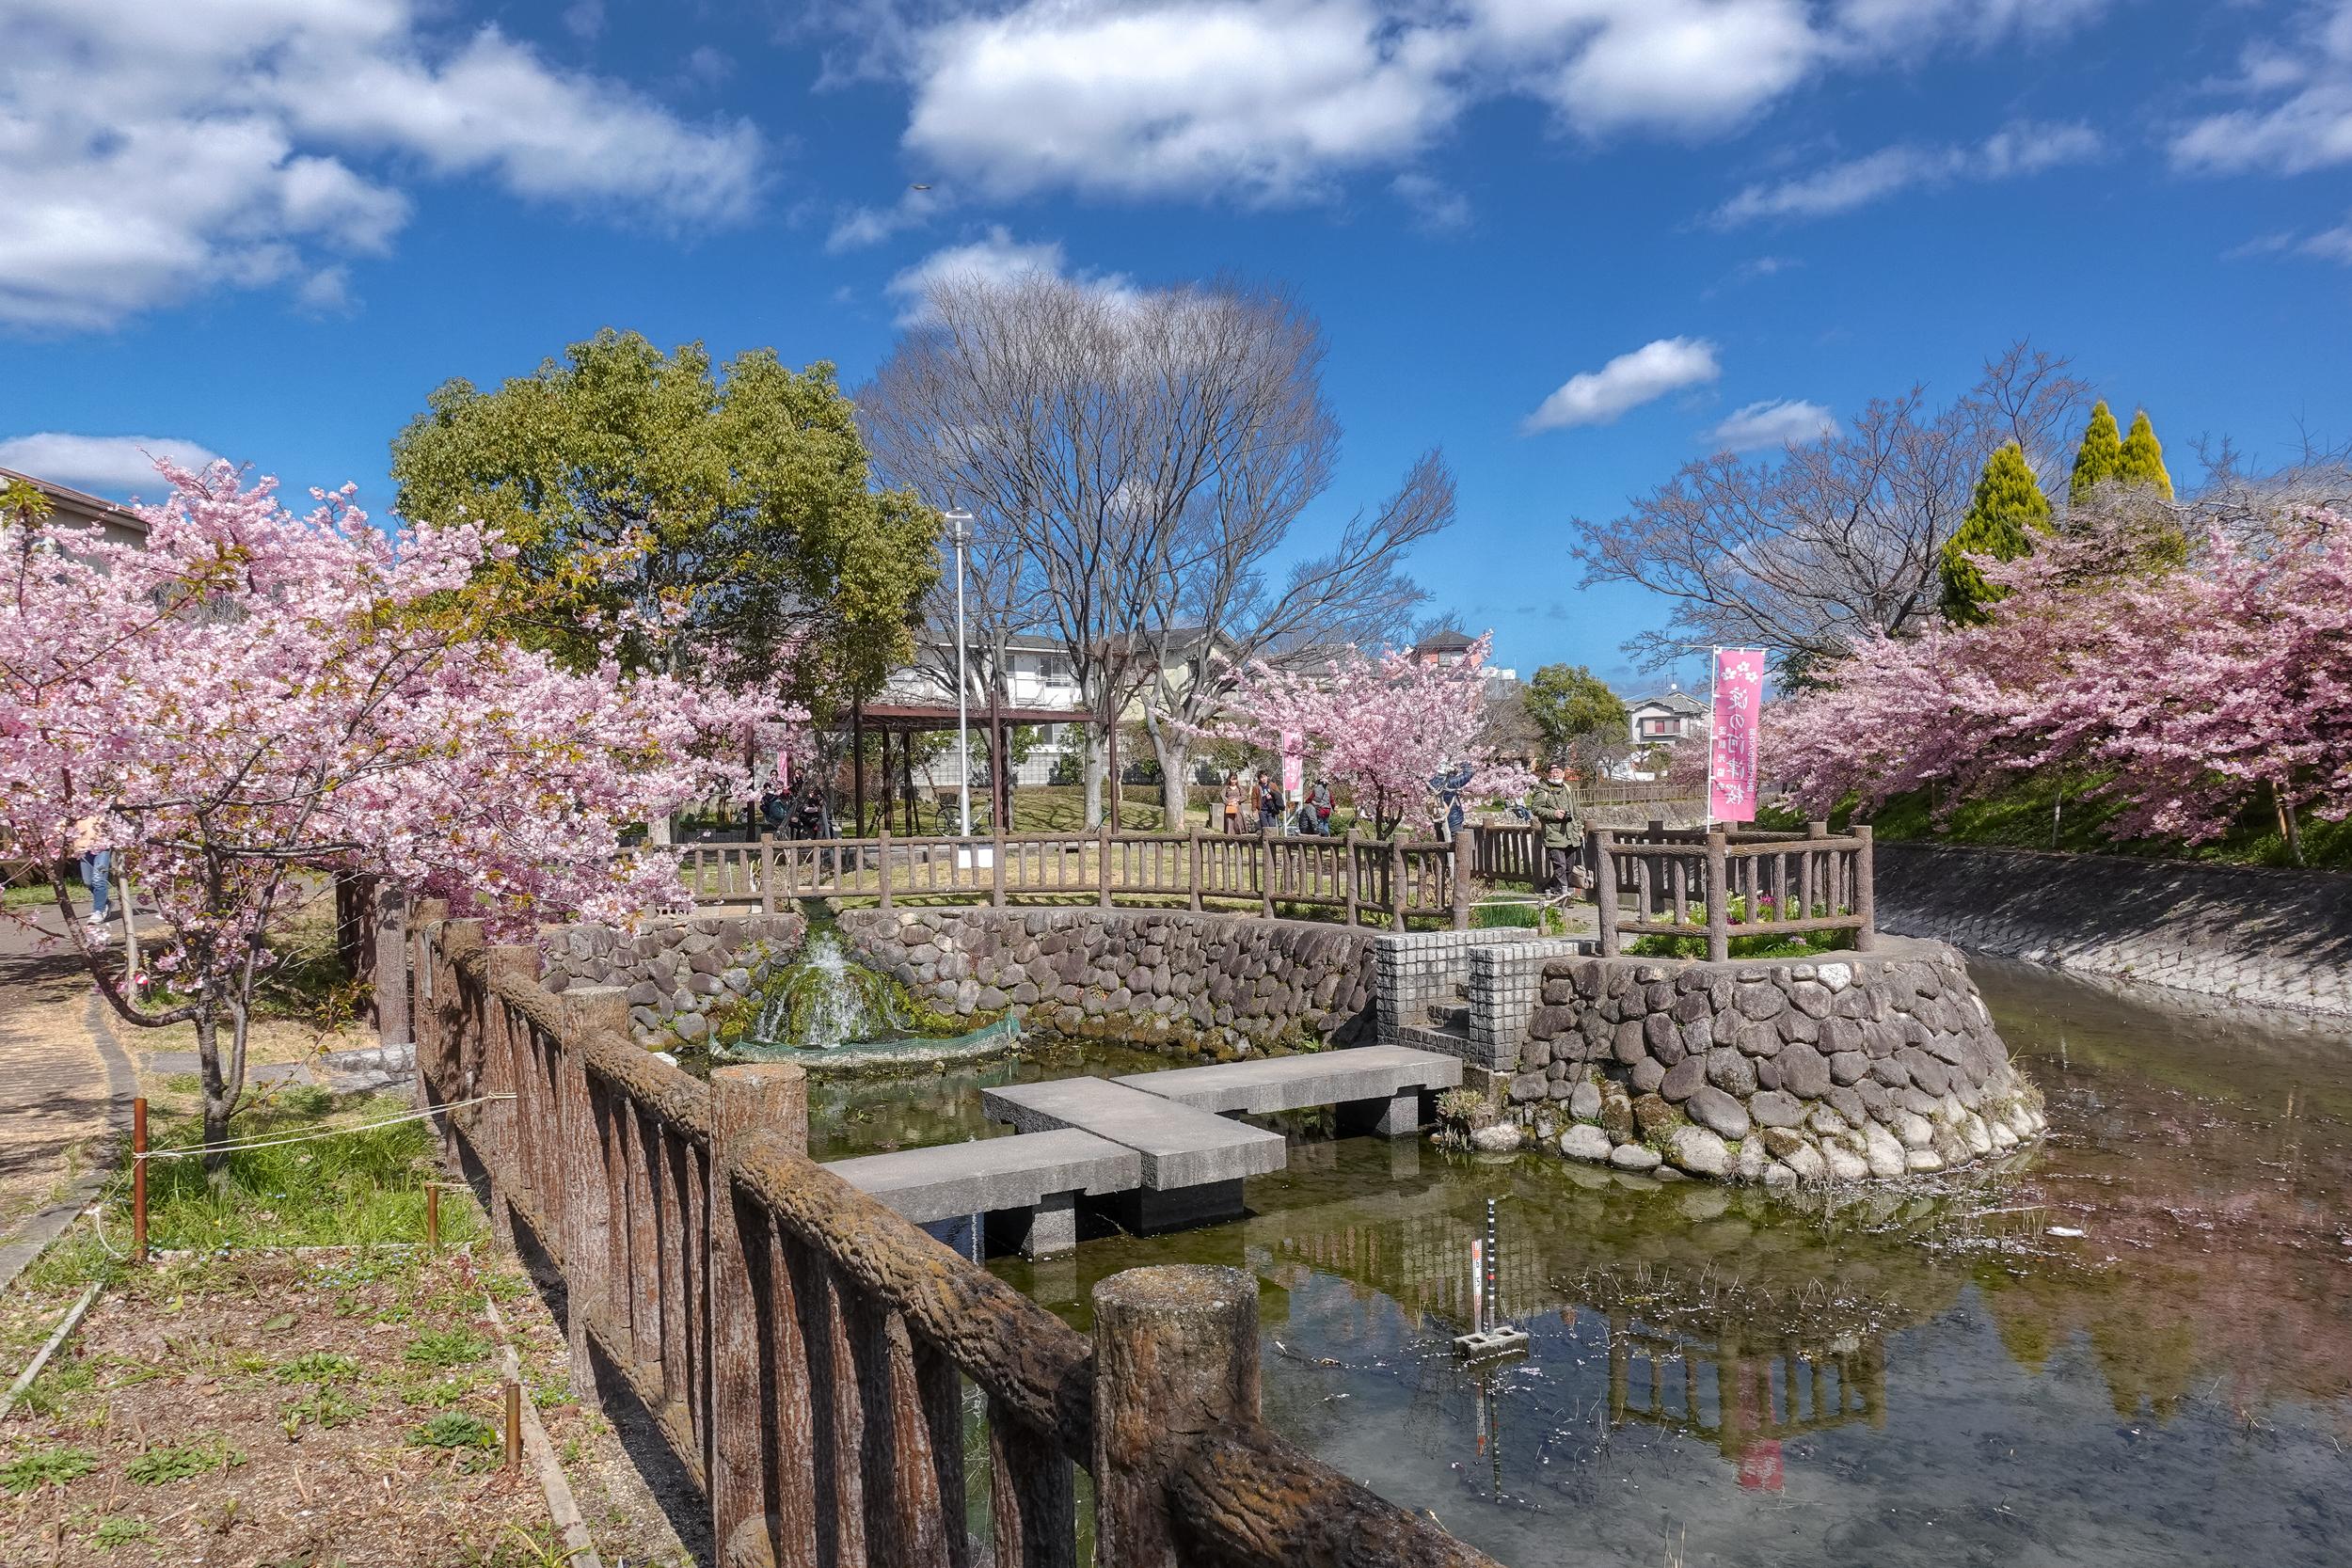 DSC03216 京都府 淀水路の河津桜(京都でいち早く桜が満開になるおすすめの河津桜写真スポット! アクセス方法や駐車場、2020年桜の開花状況など)